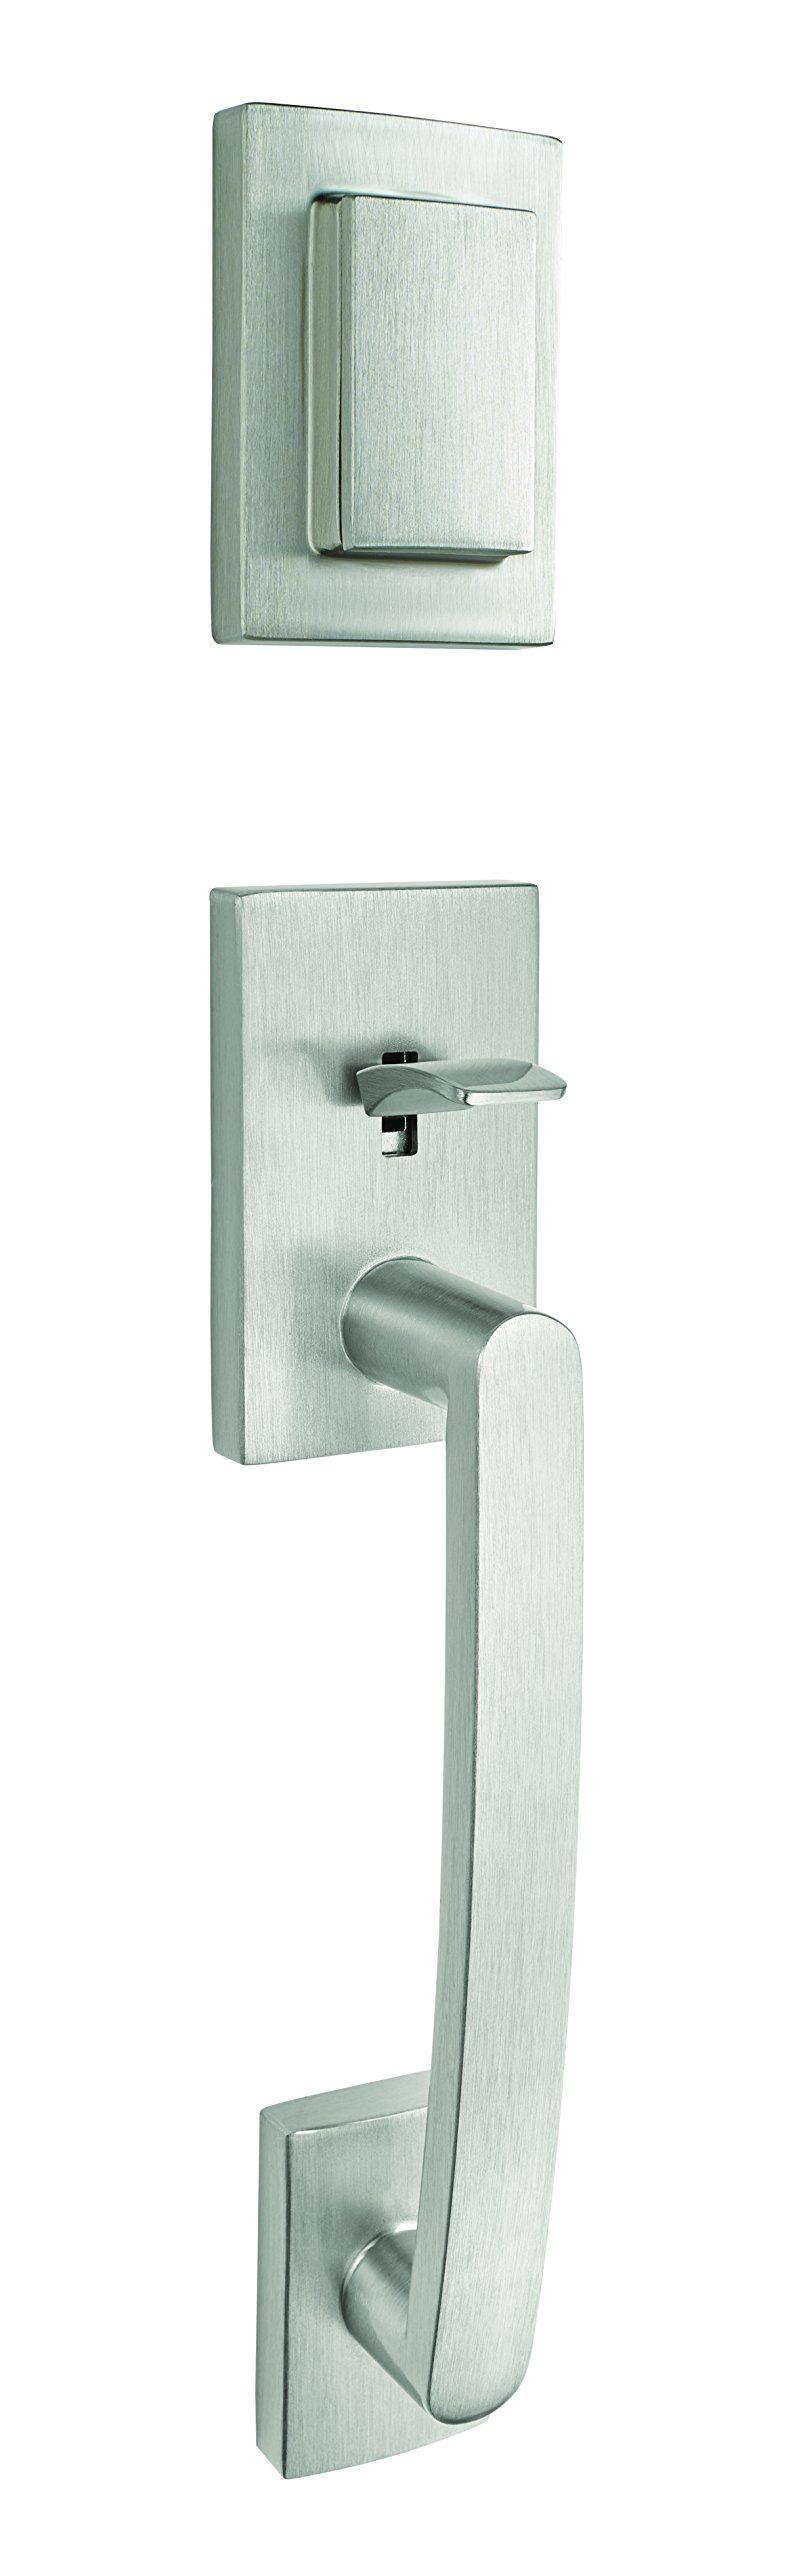 Baldwin Prestige Spyglass Single Cylinder Handle Set with Spyglass Lever Featuring Smart Key in Satin Nickel